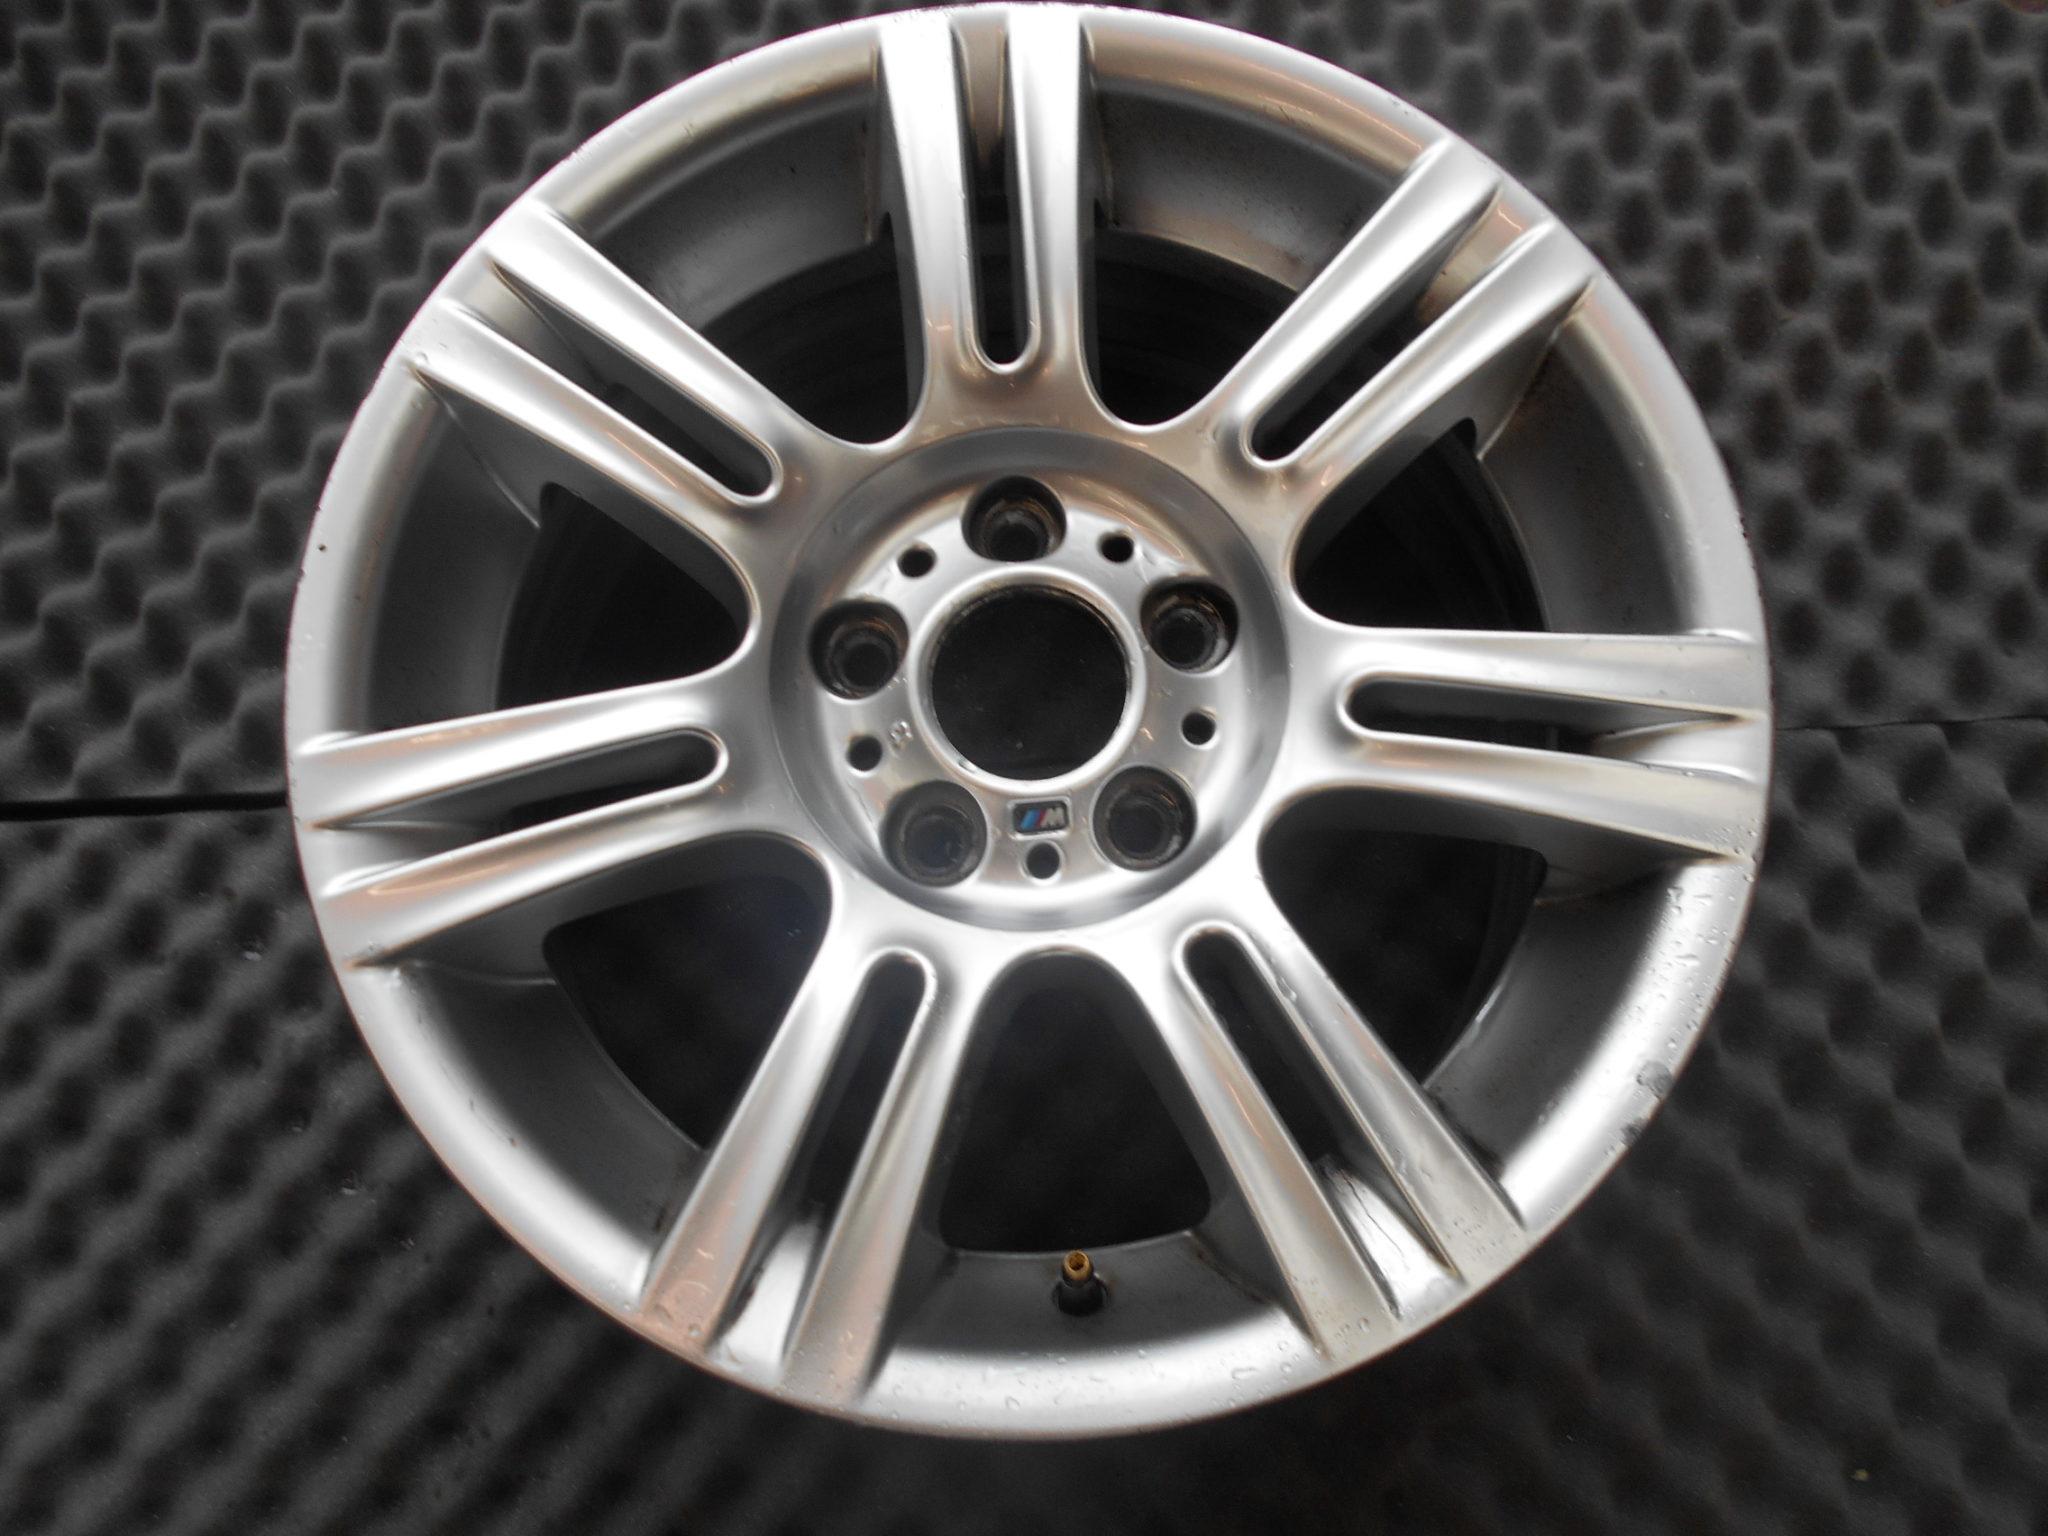 factory inv spoke of rim styles alloy itm star style bmw wheel series set